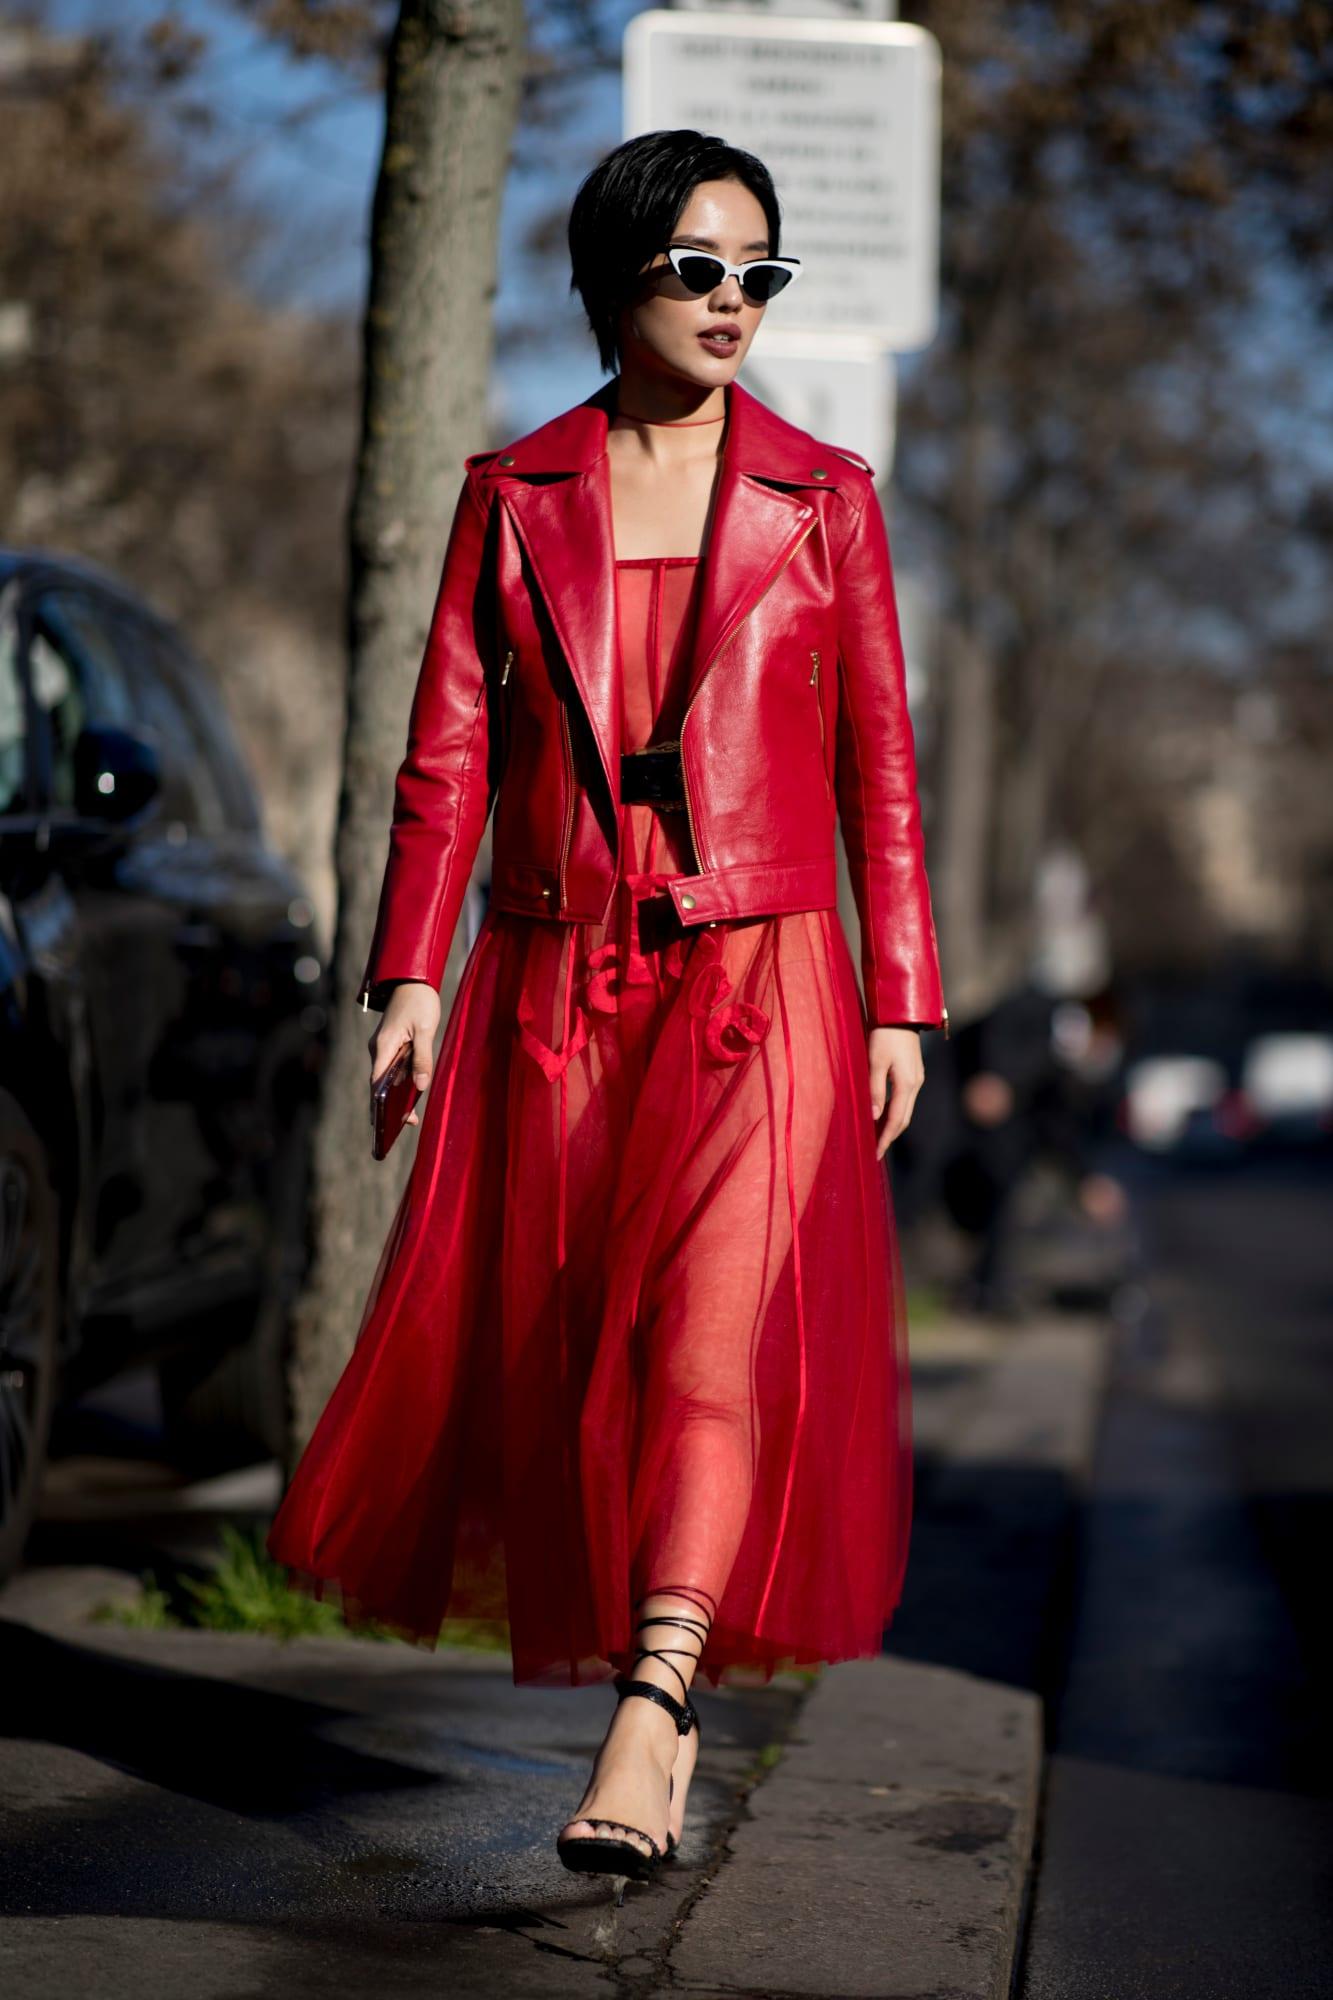 paris-fashion-week-fall-2019-street-style-day-2-41